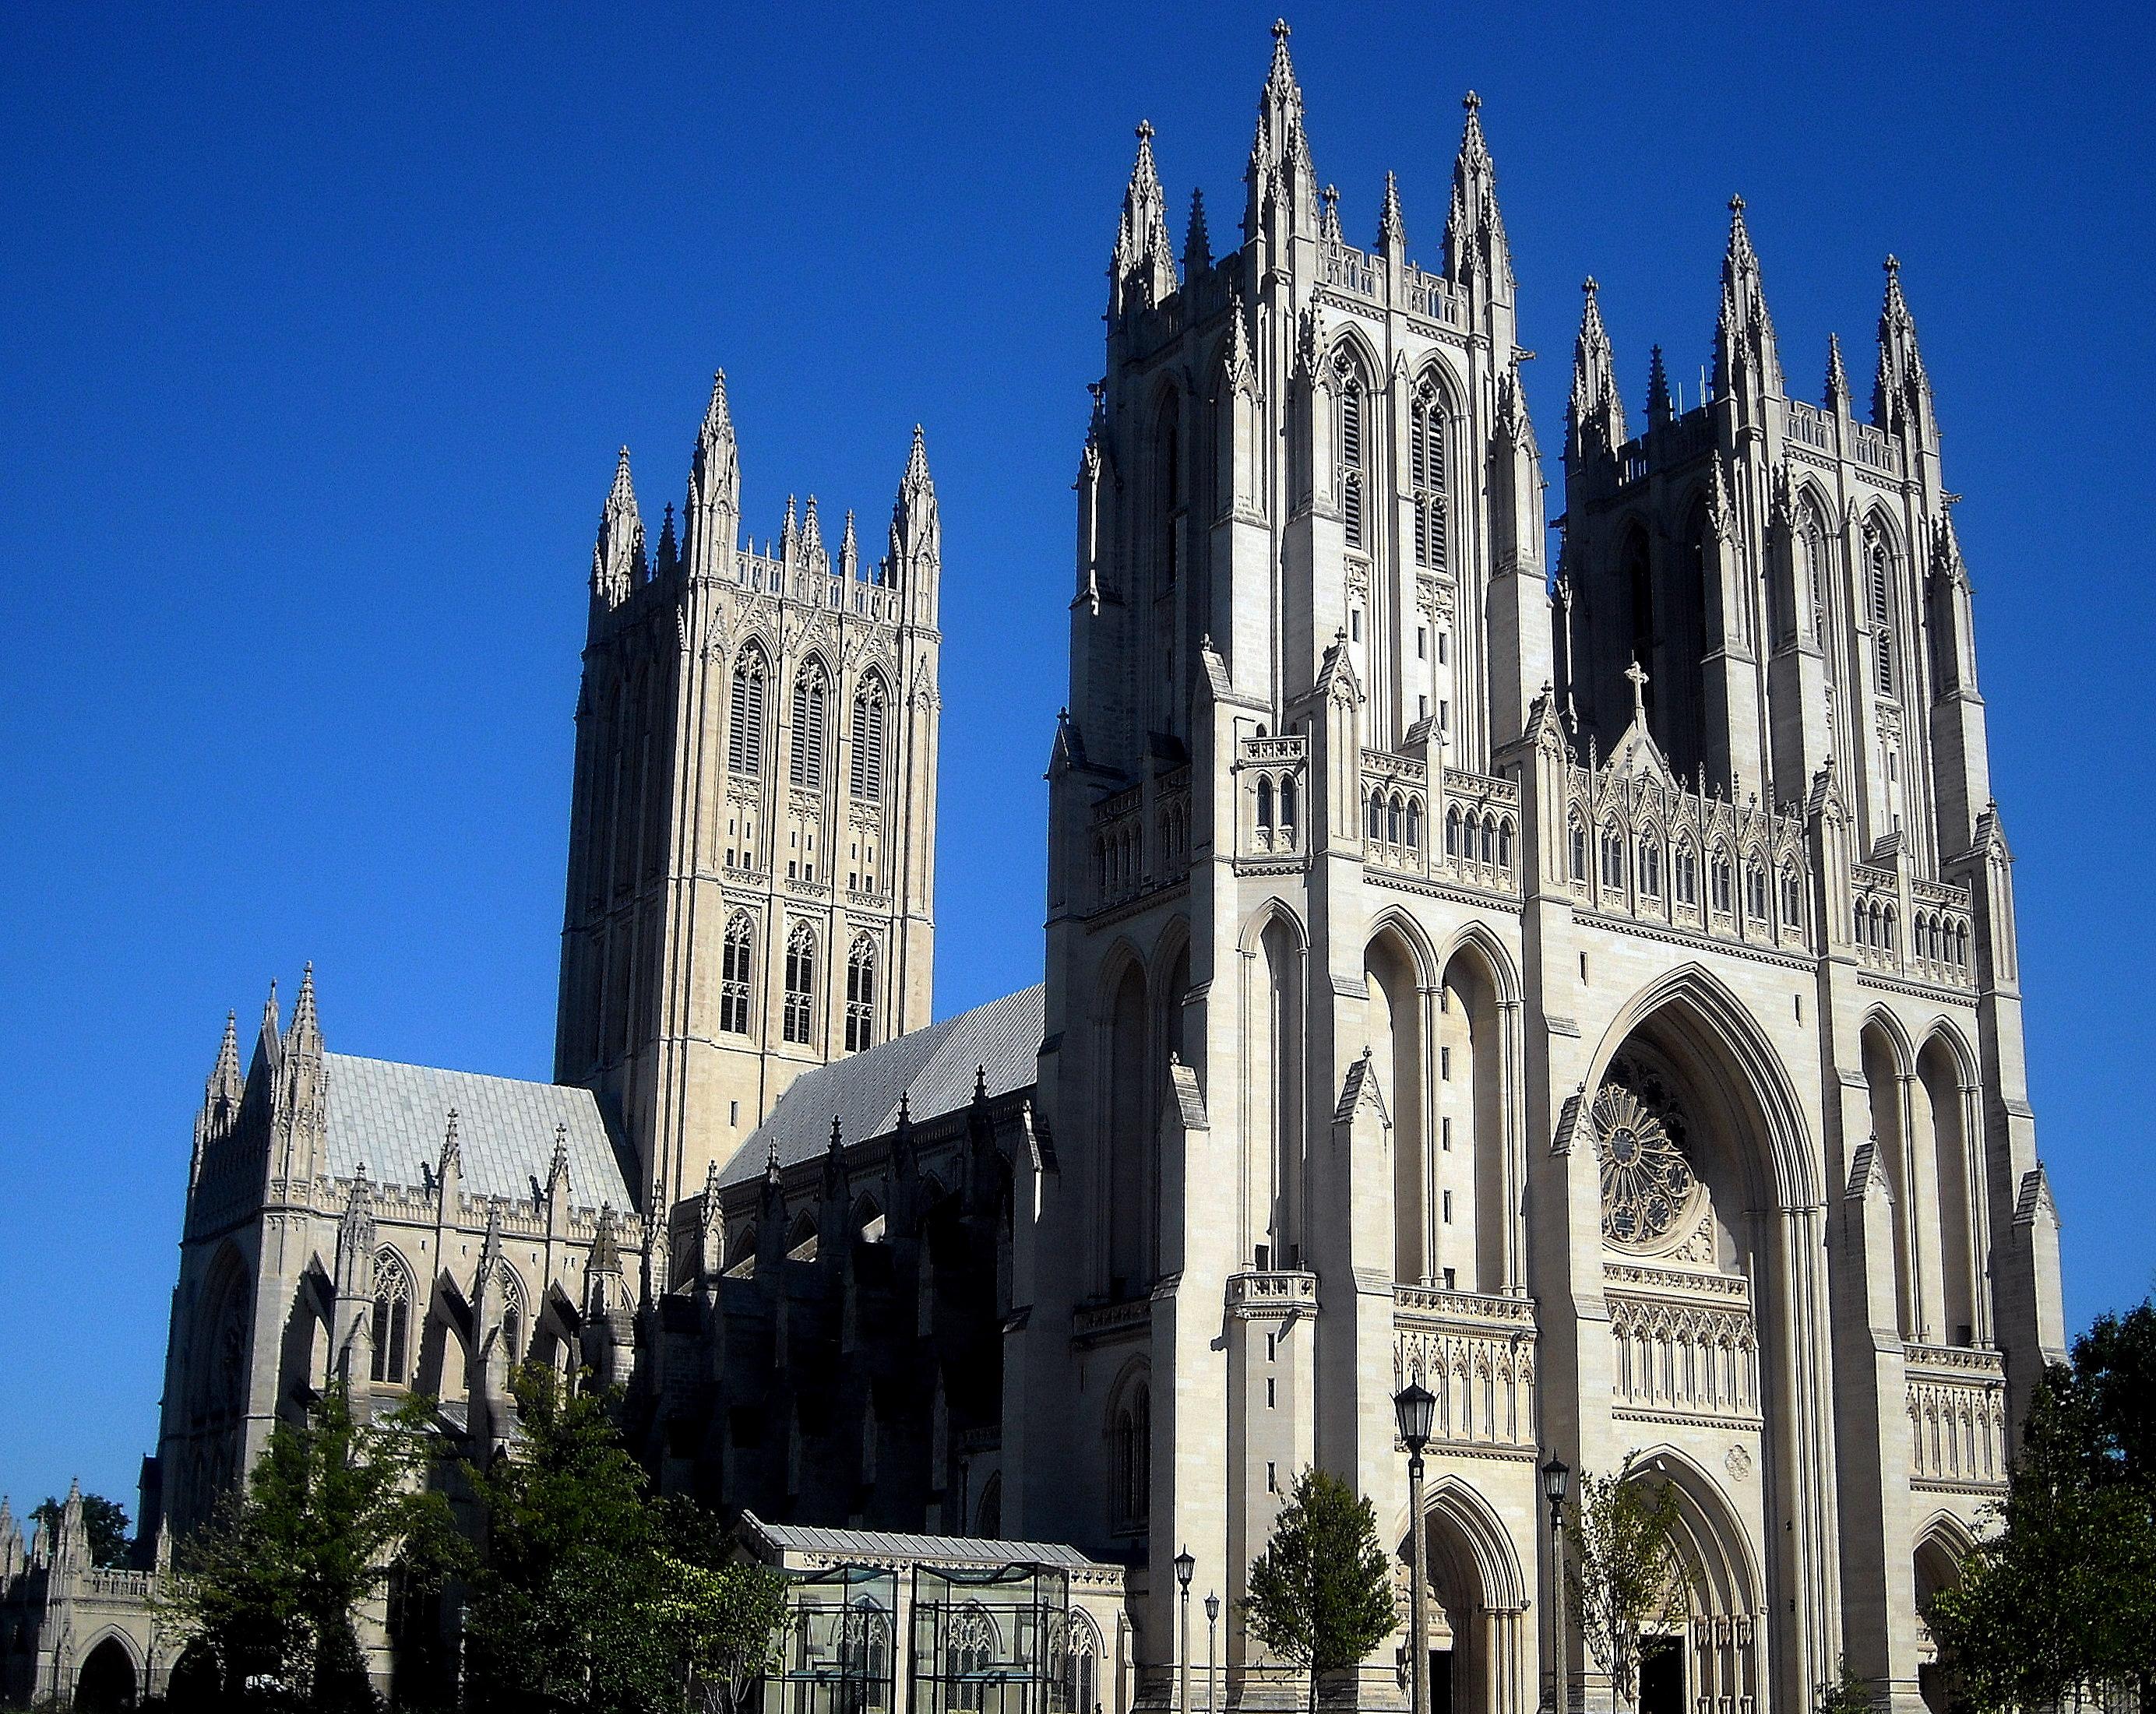 http://upload.wikimedia.org/wikipedia/commons/0/01/Washington_National_Cathedral_in_Washington%2C_D.C..jpg